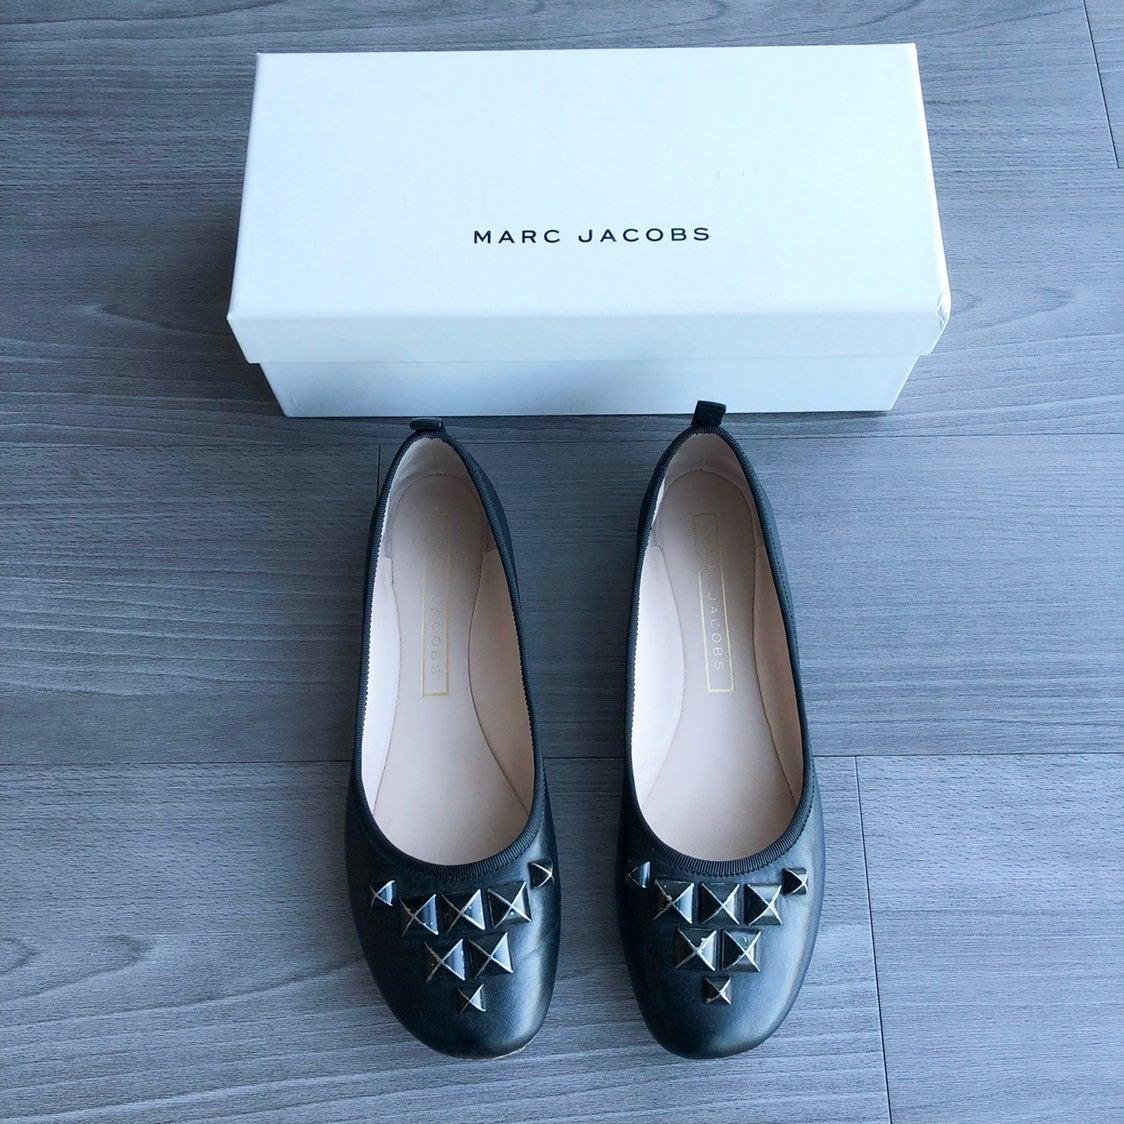 Marc Jacobs Cleo Flats - Size 7